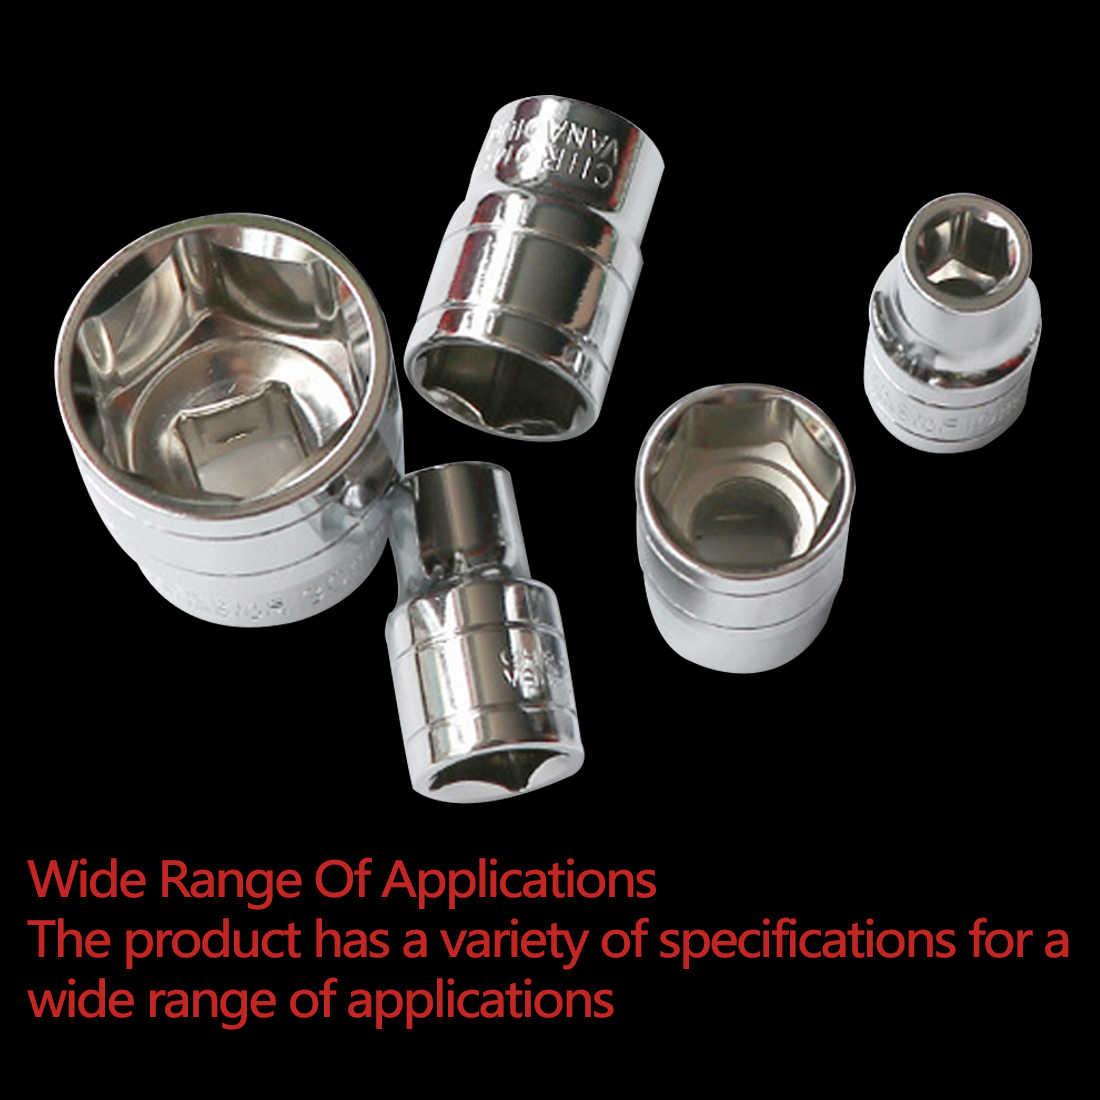 14mm-24mm iç altıgen anahtarı cırcır lokma anahtar kafa kol çift uçlu Mini kısa sökülebilir tork